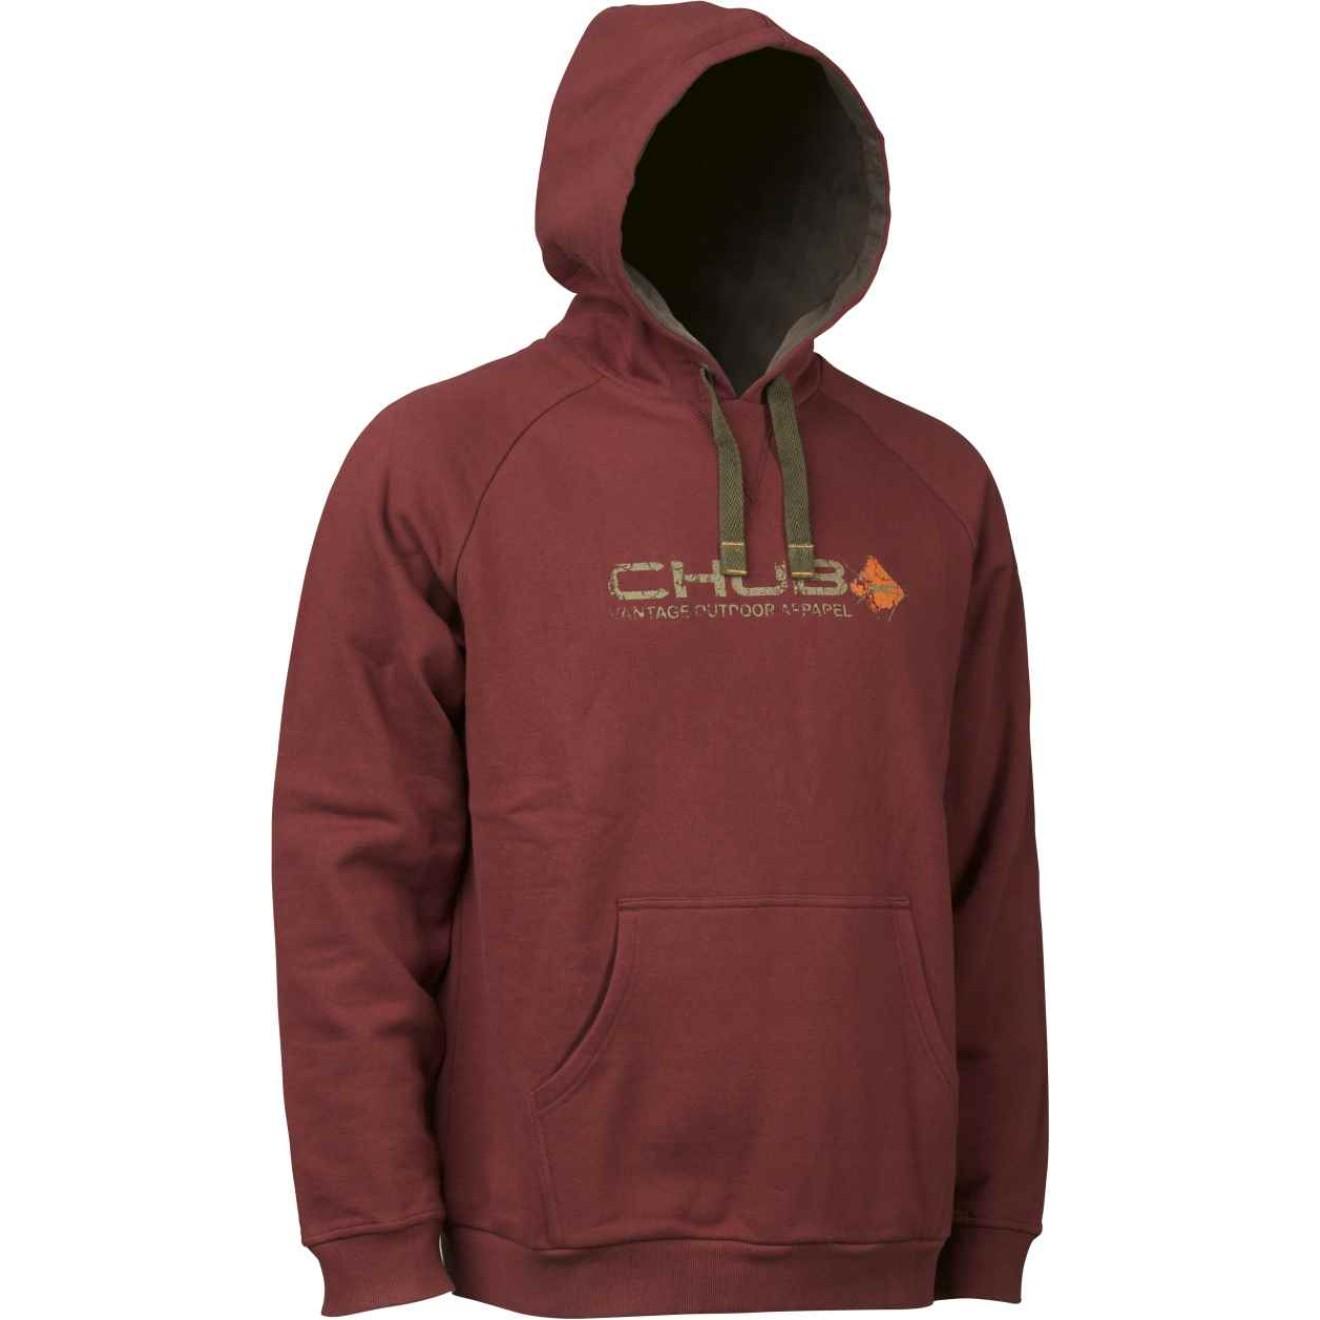 Chub Softshell Jacke Gr M Hemden & T-Shirts Bekleidung